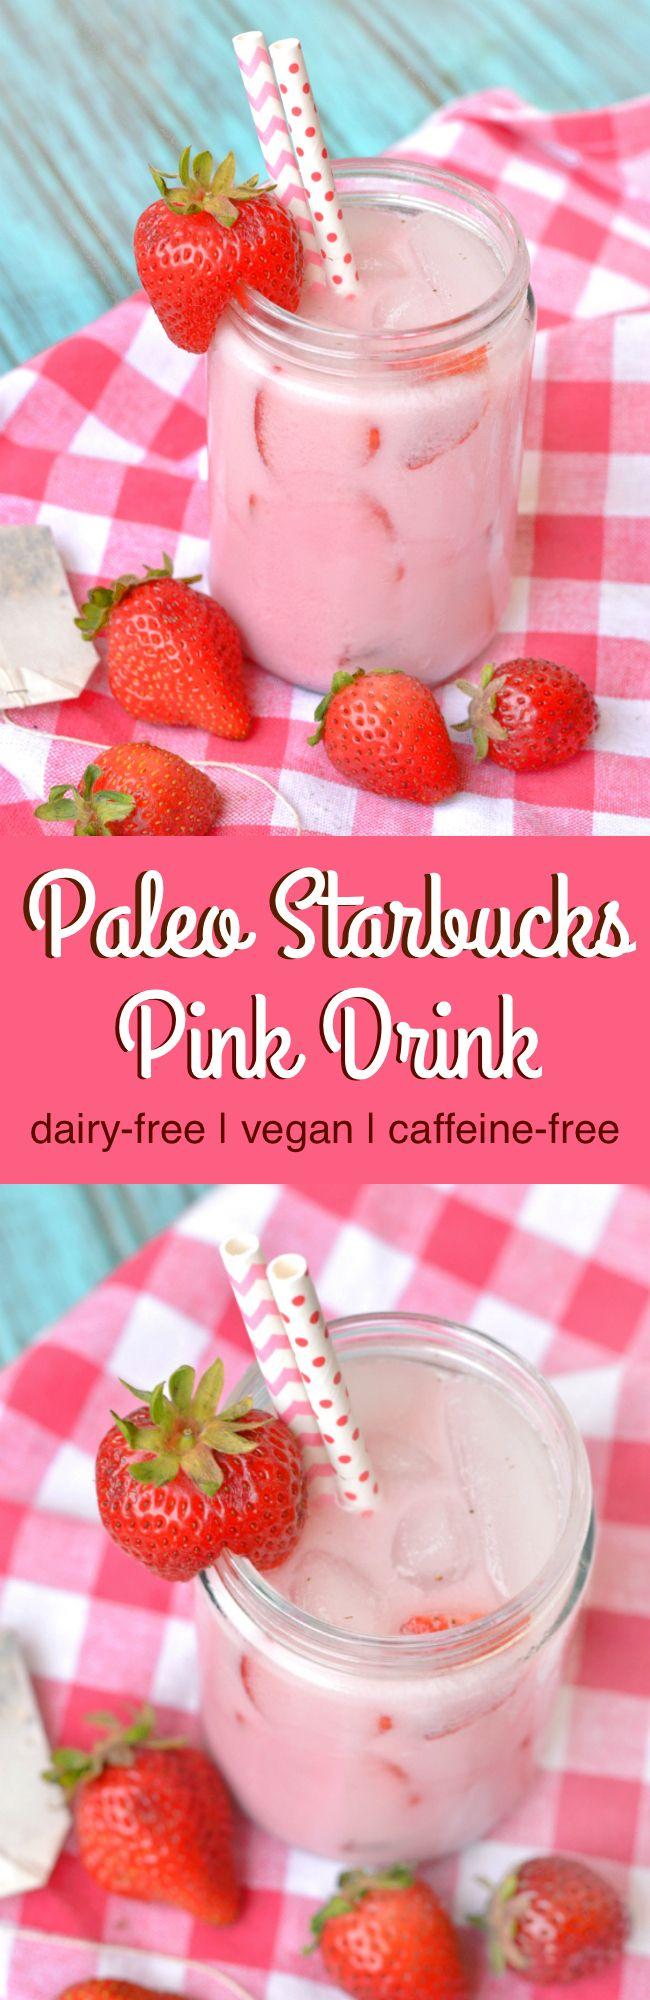 Paleo Starbucks Pink Drink   Plaid and Paleo